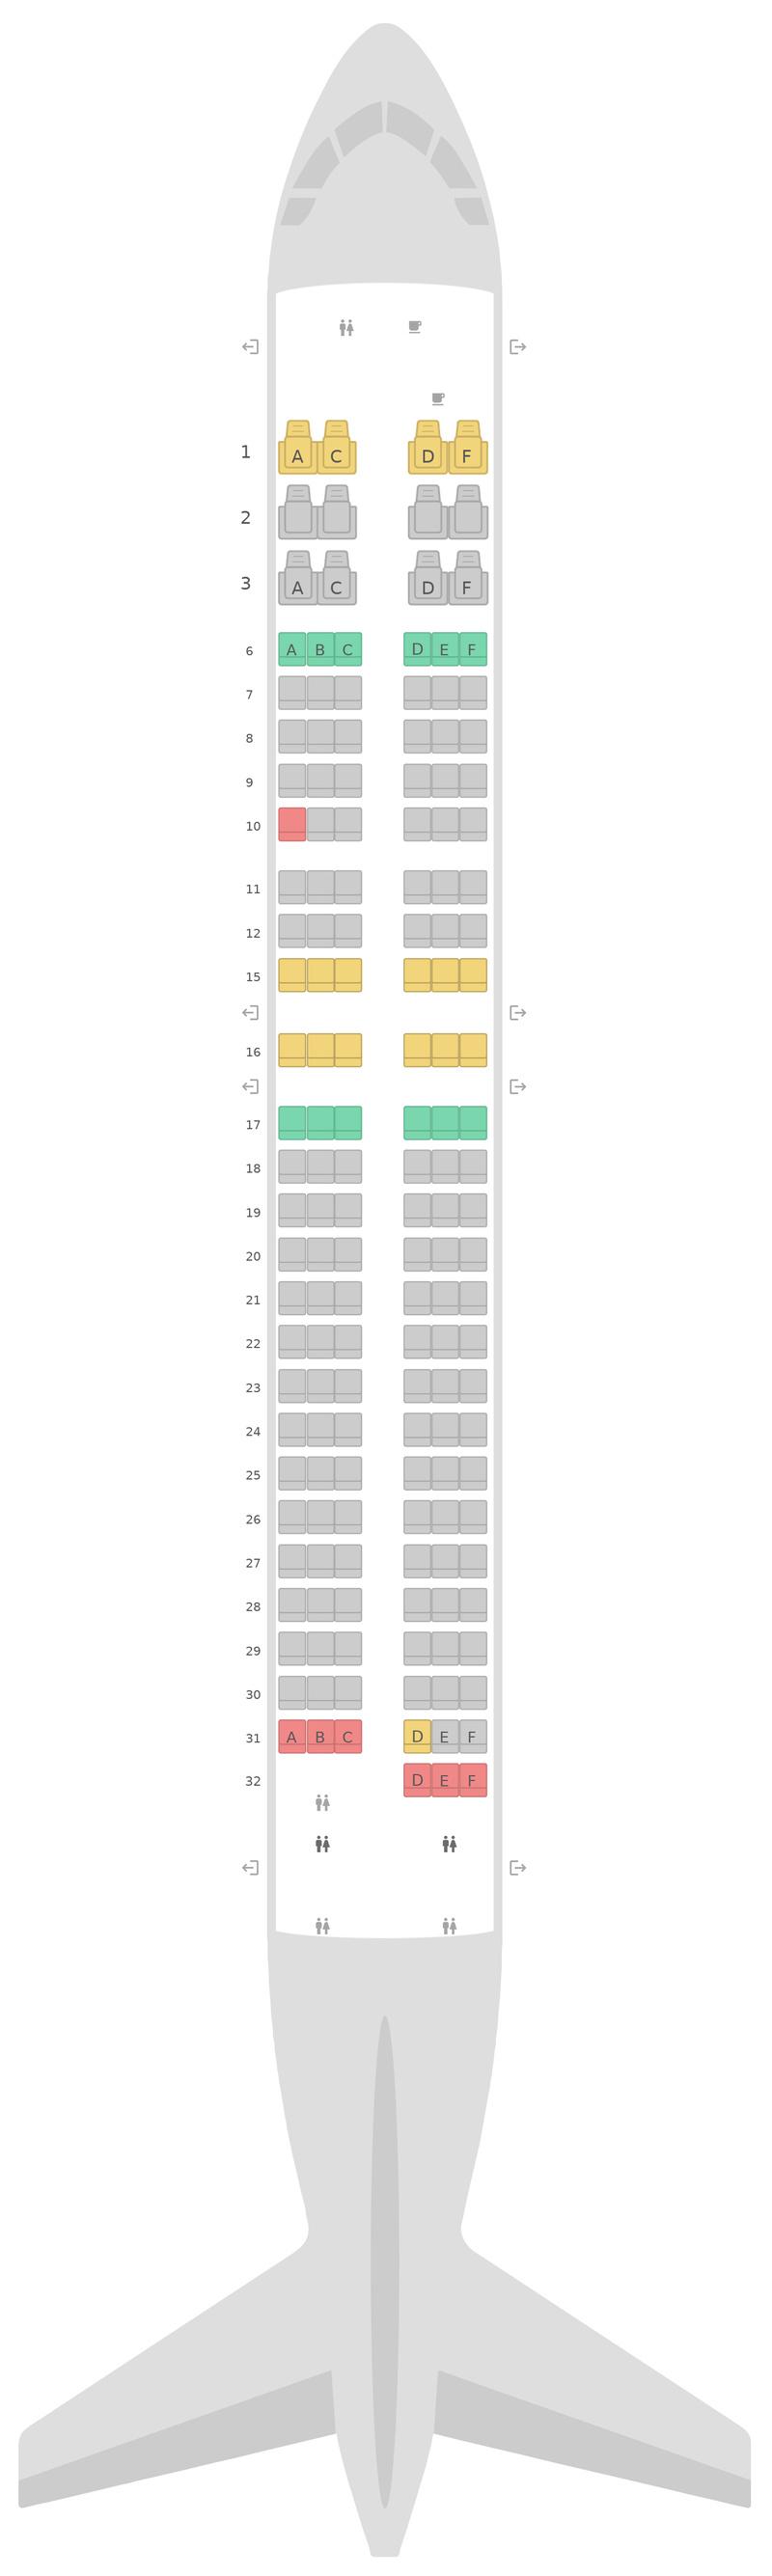 Схема салона Боинг 737-800 (738) Аляска Эйрлайнс